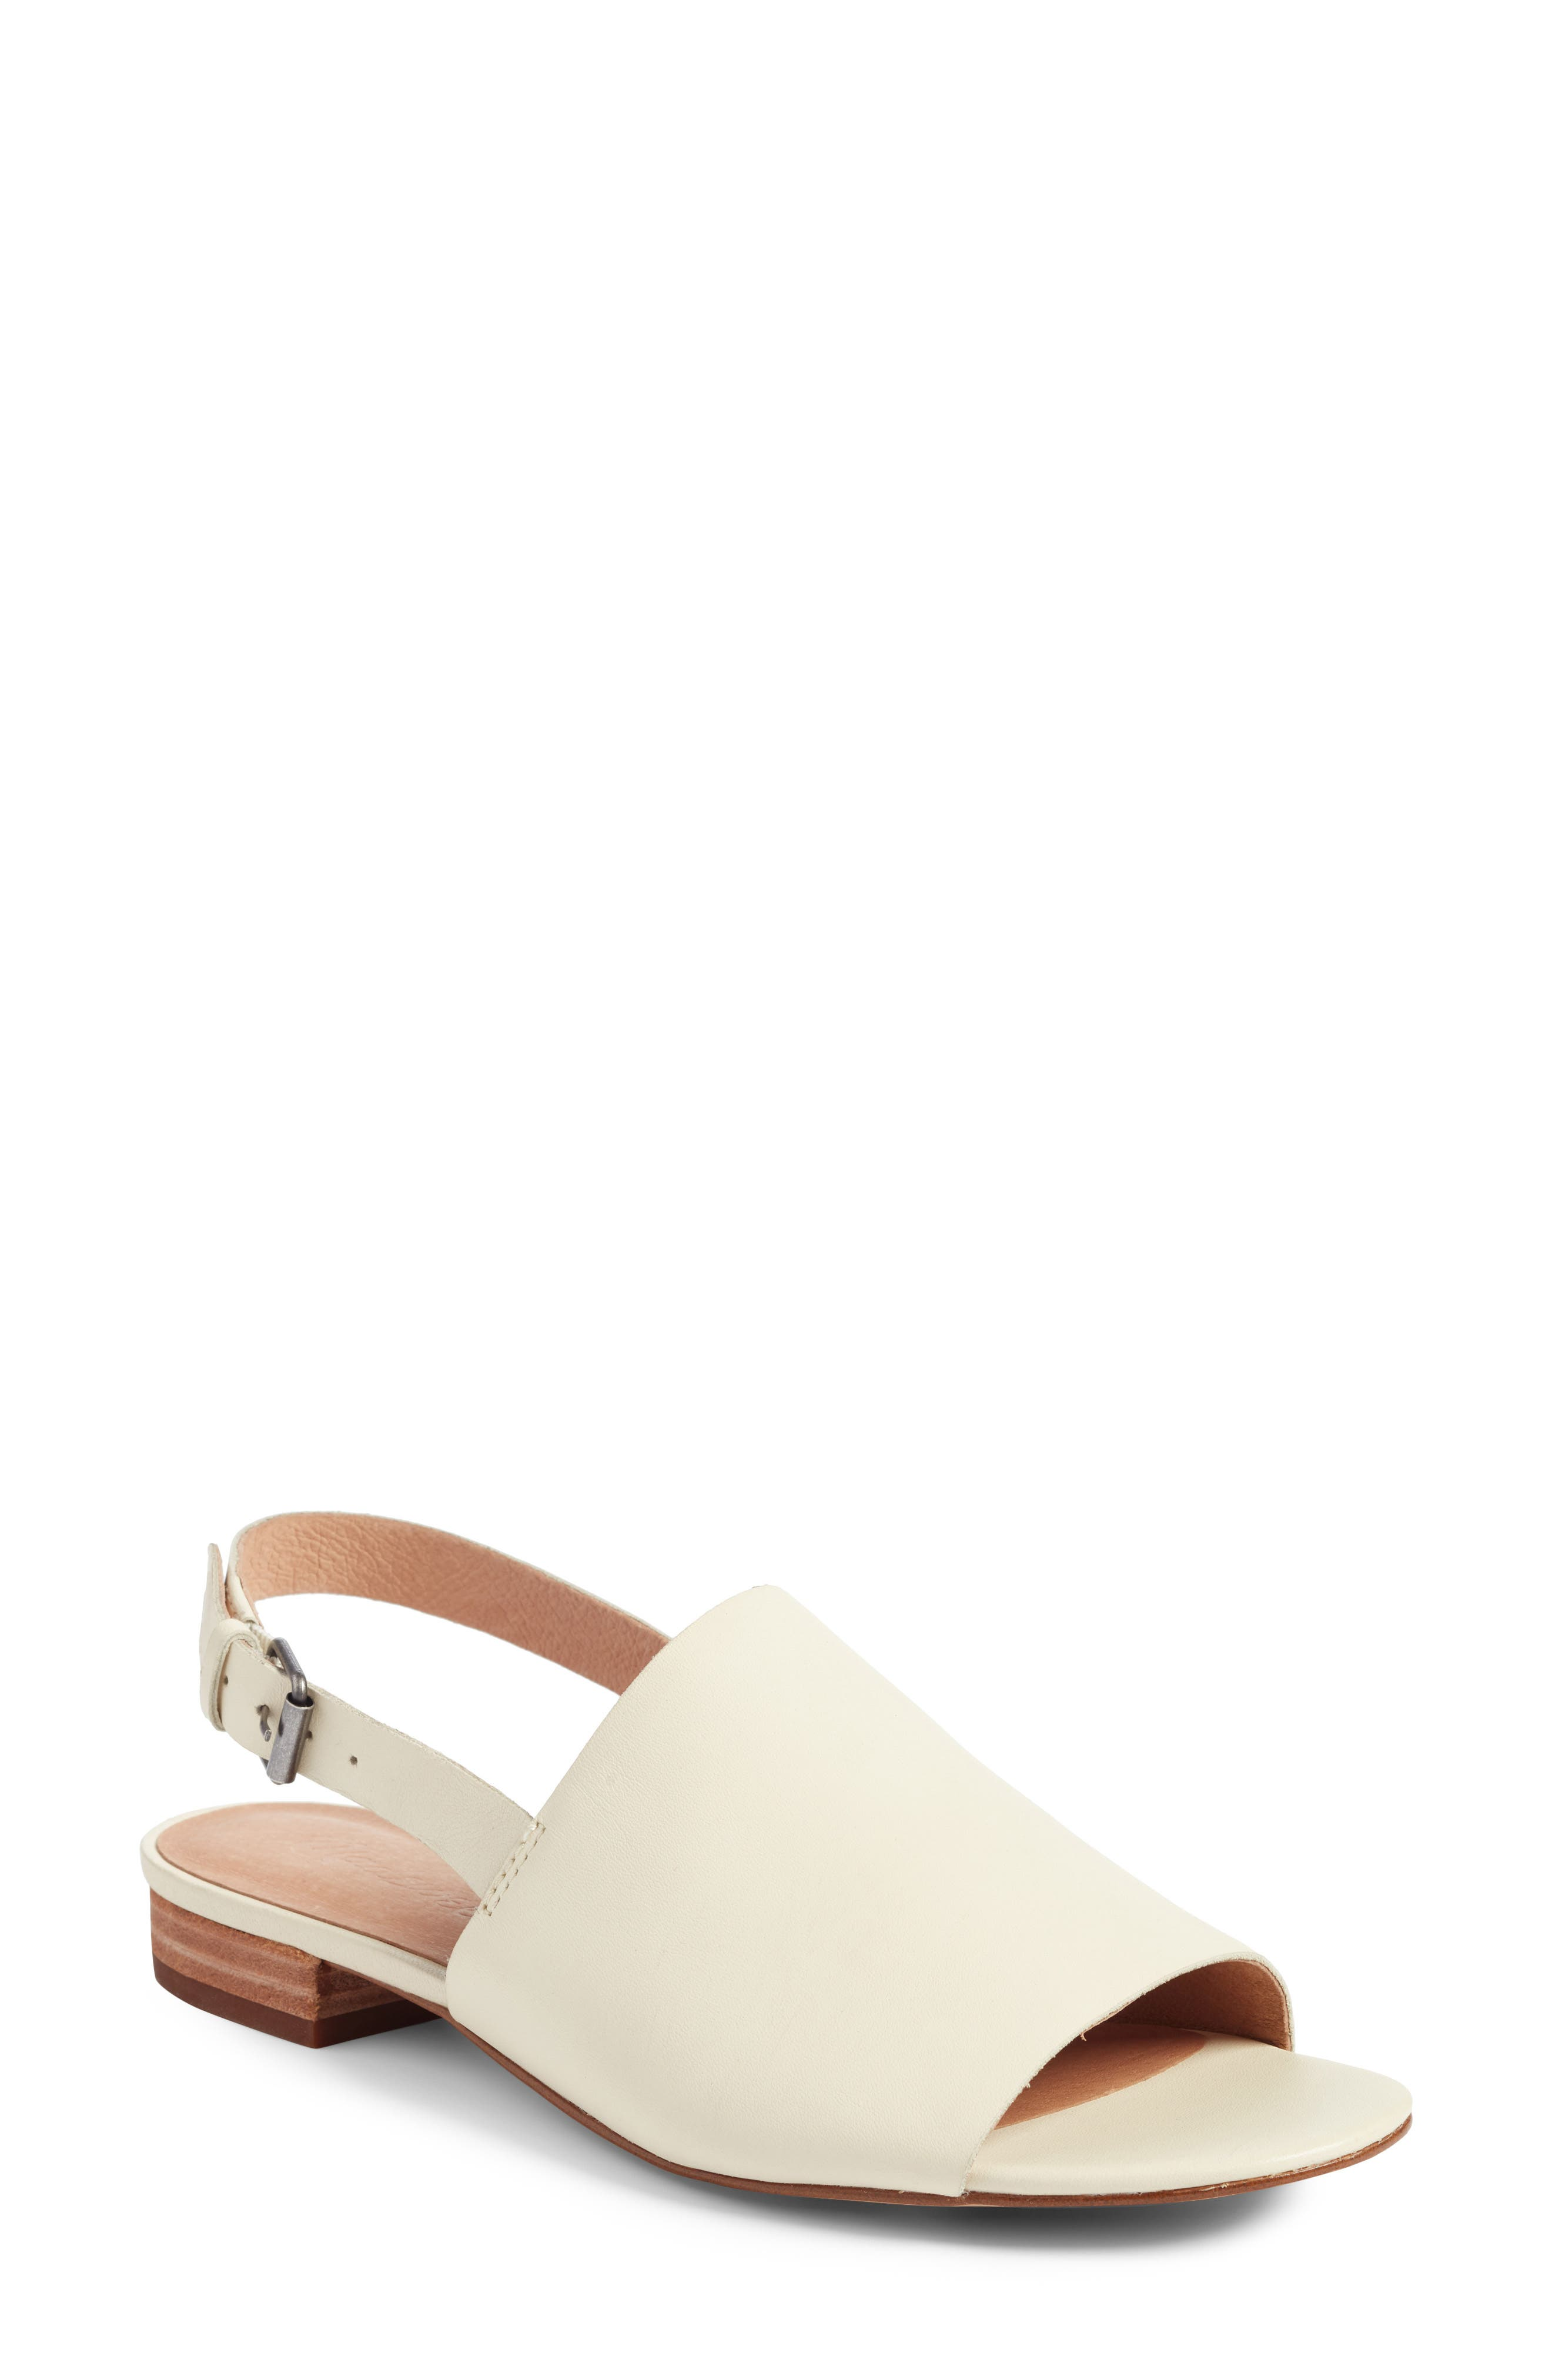 Noelle Slingback Sandal,                         Main,                         color, Vintage Canvas Leather